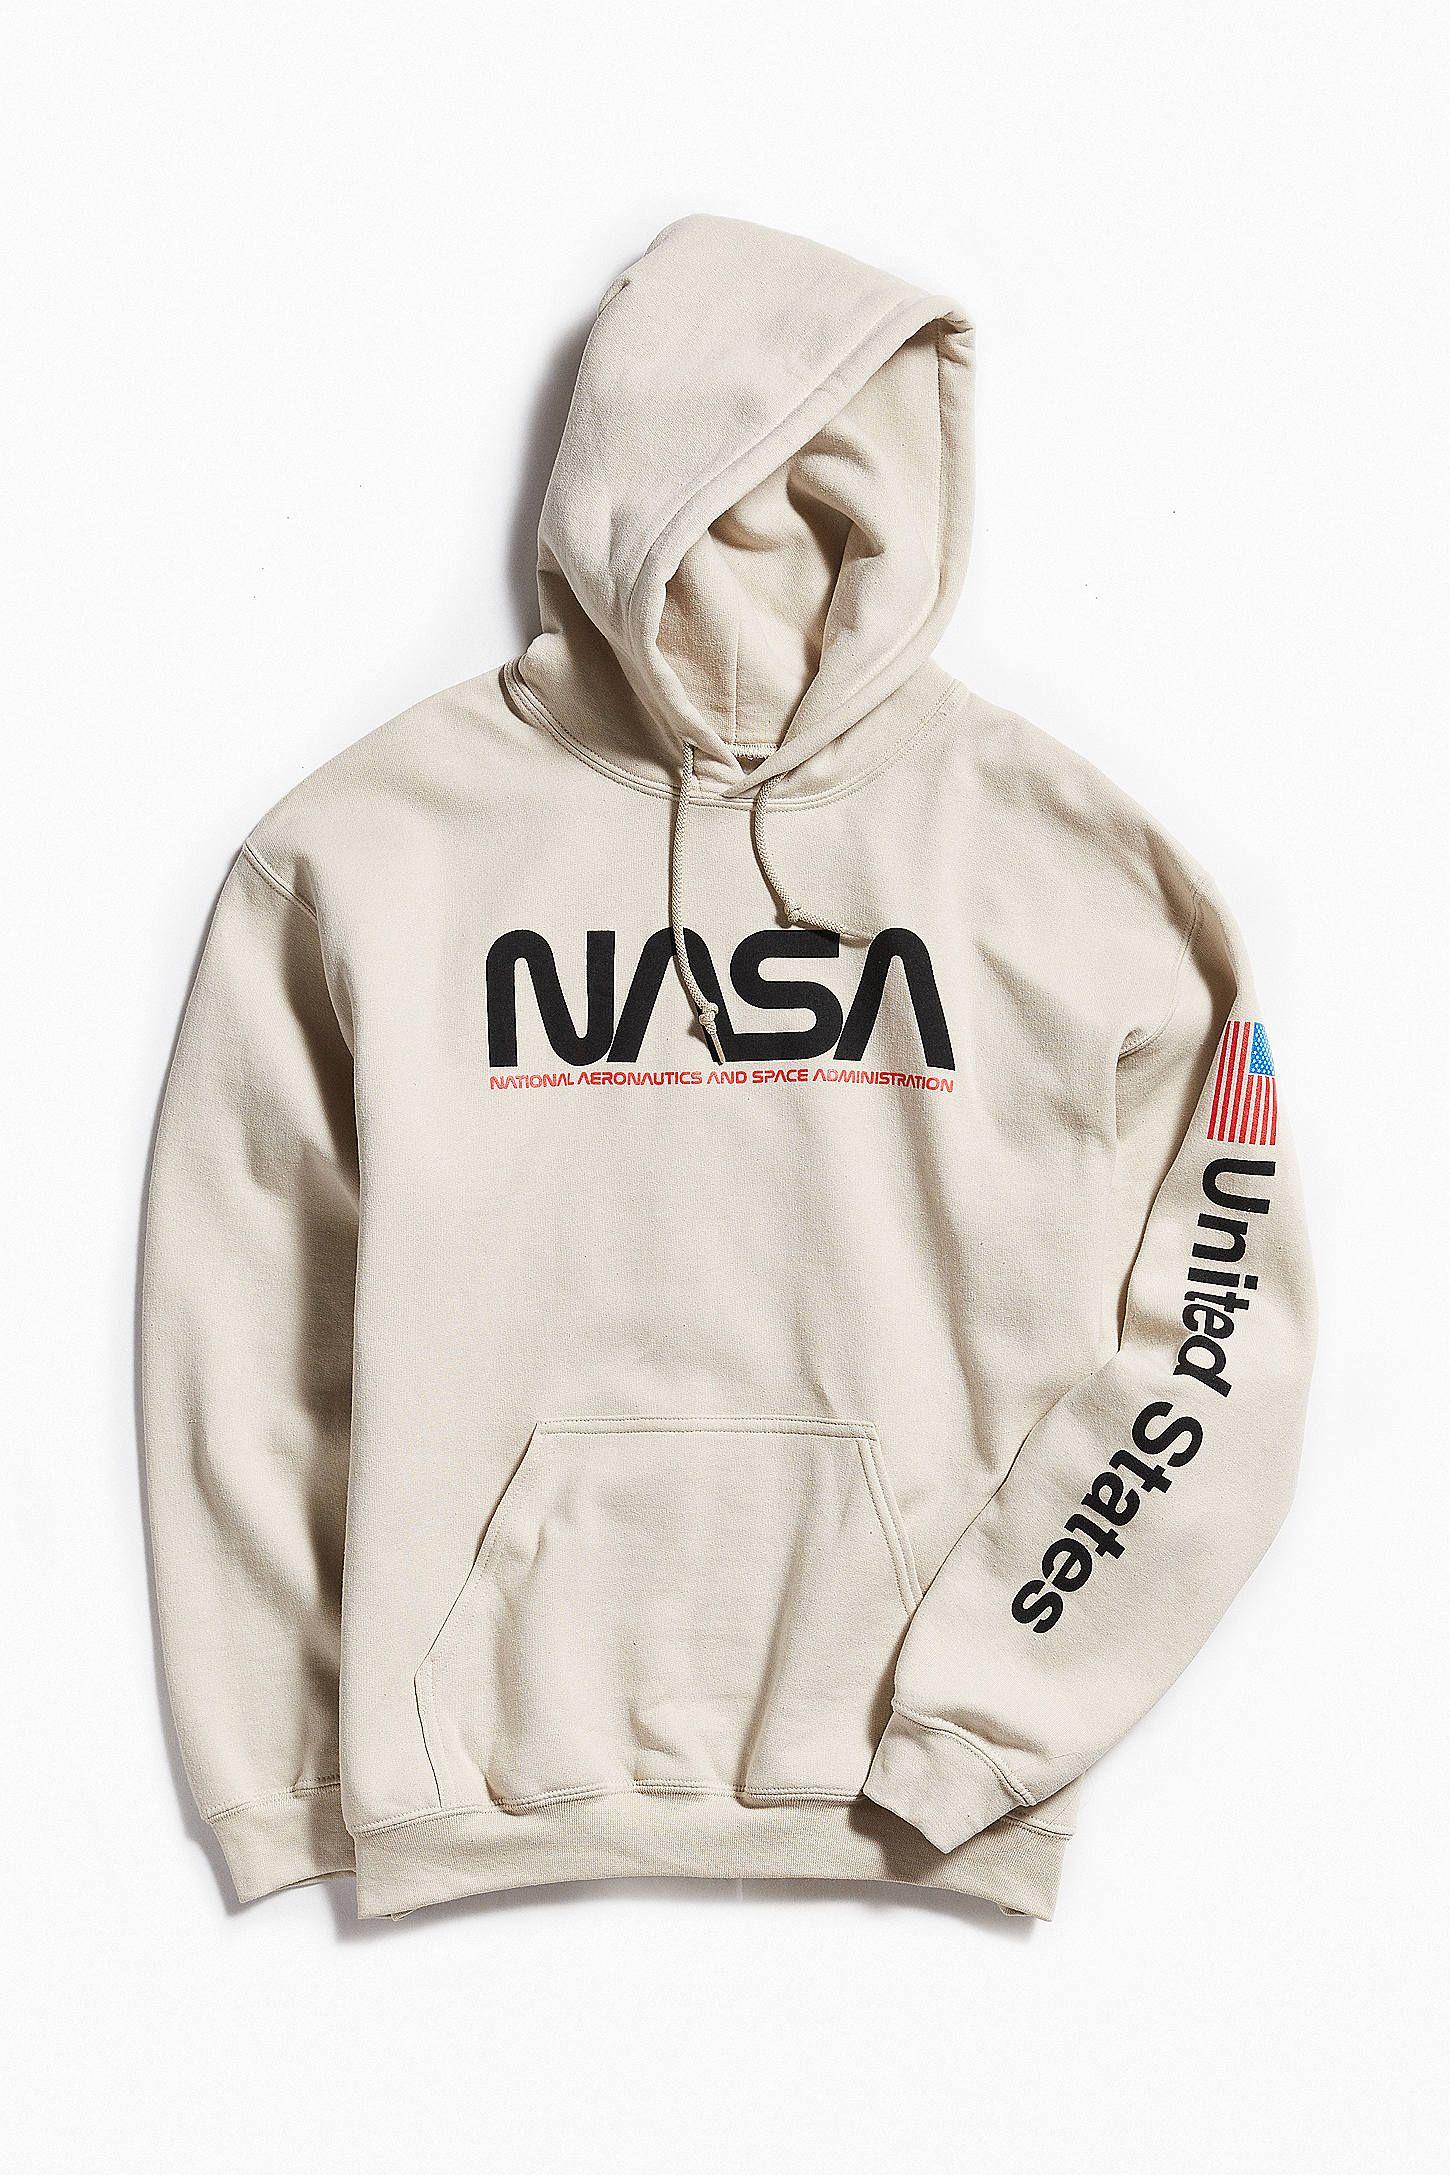 NASA Space Mens Women/'s Hoody Sweatshirts  Zipper Skateboard Sweatshirt Hoodies